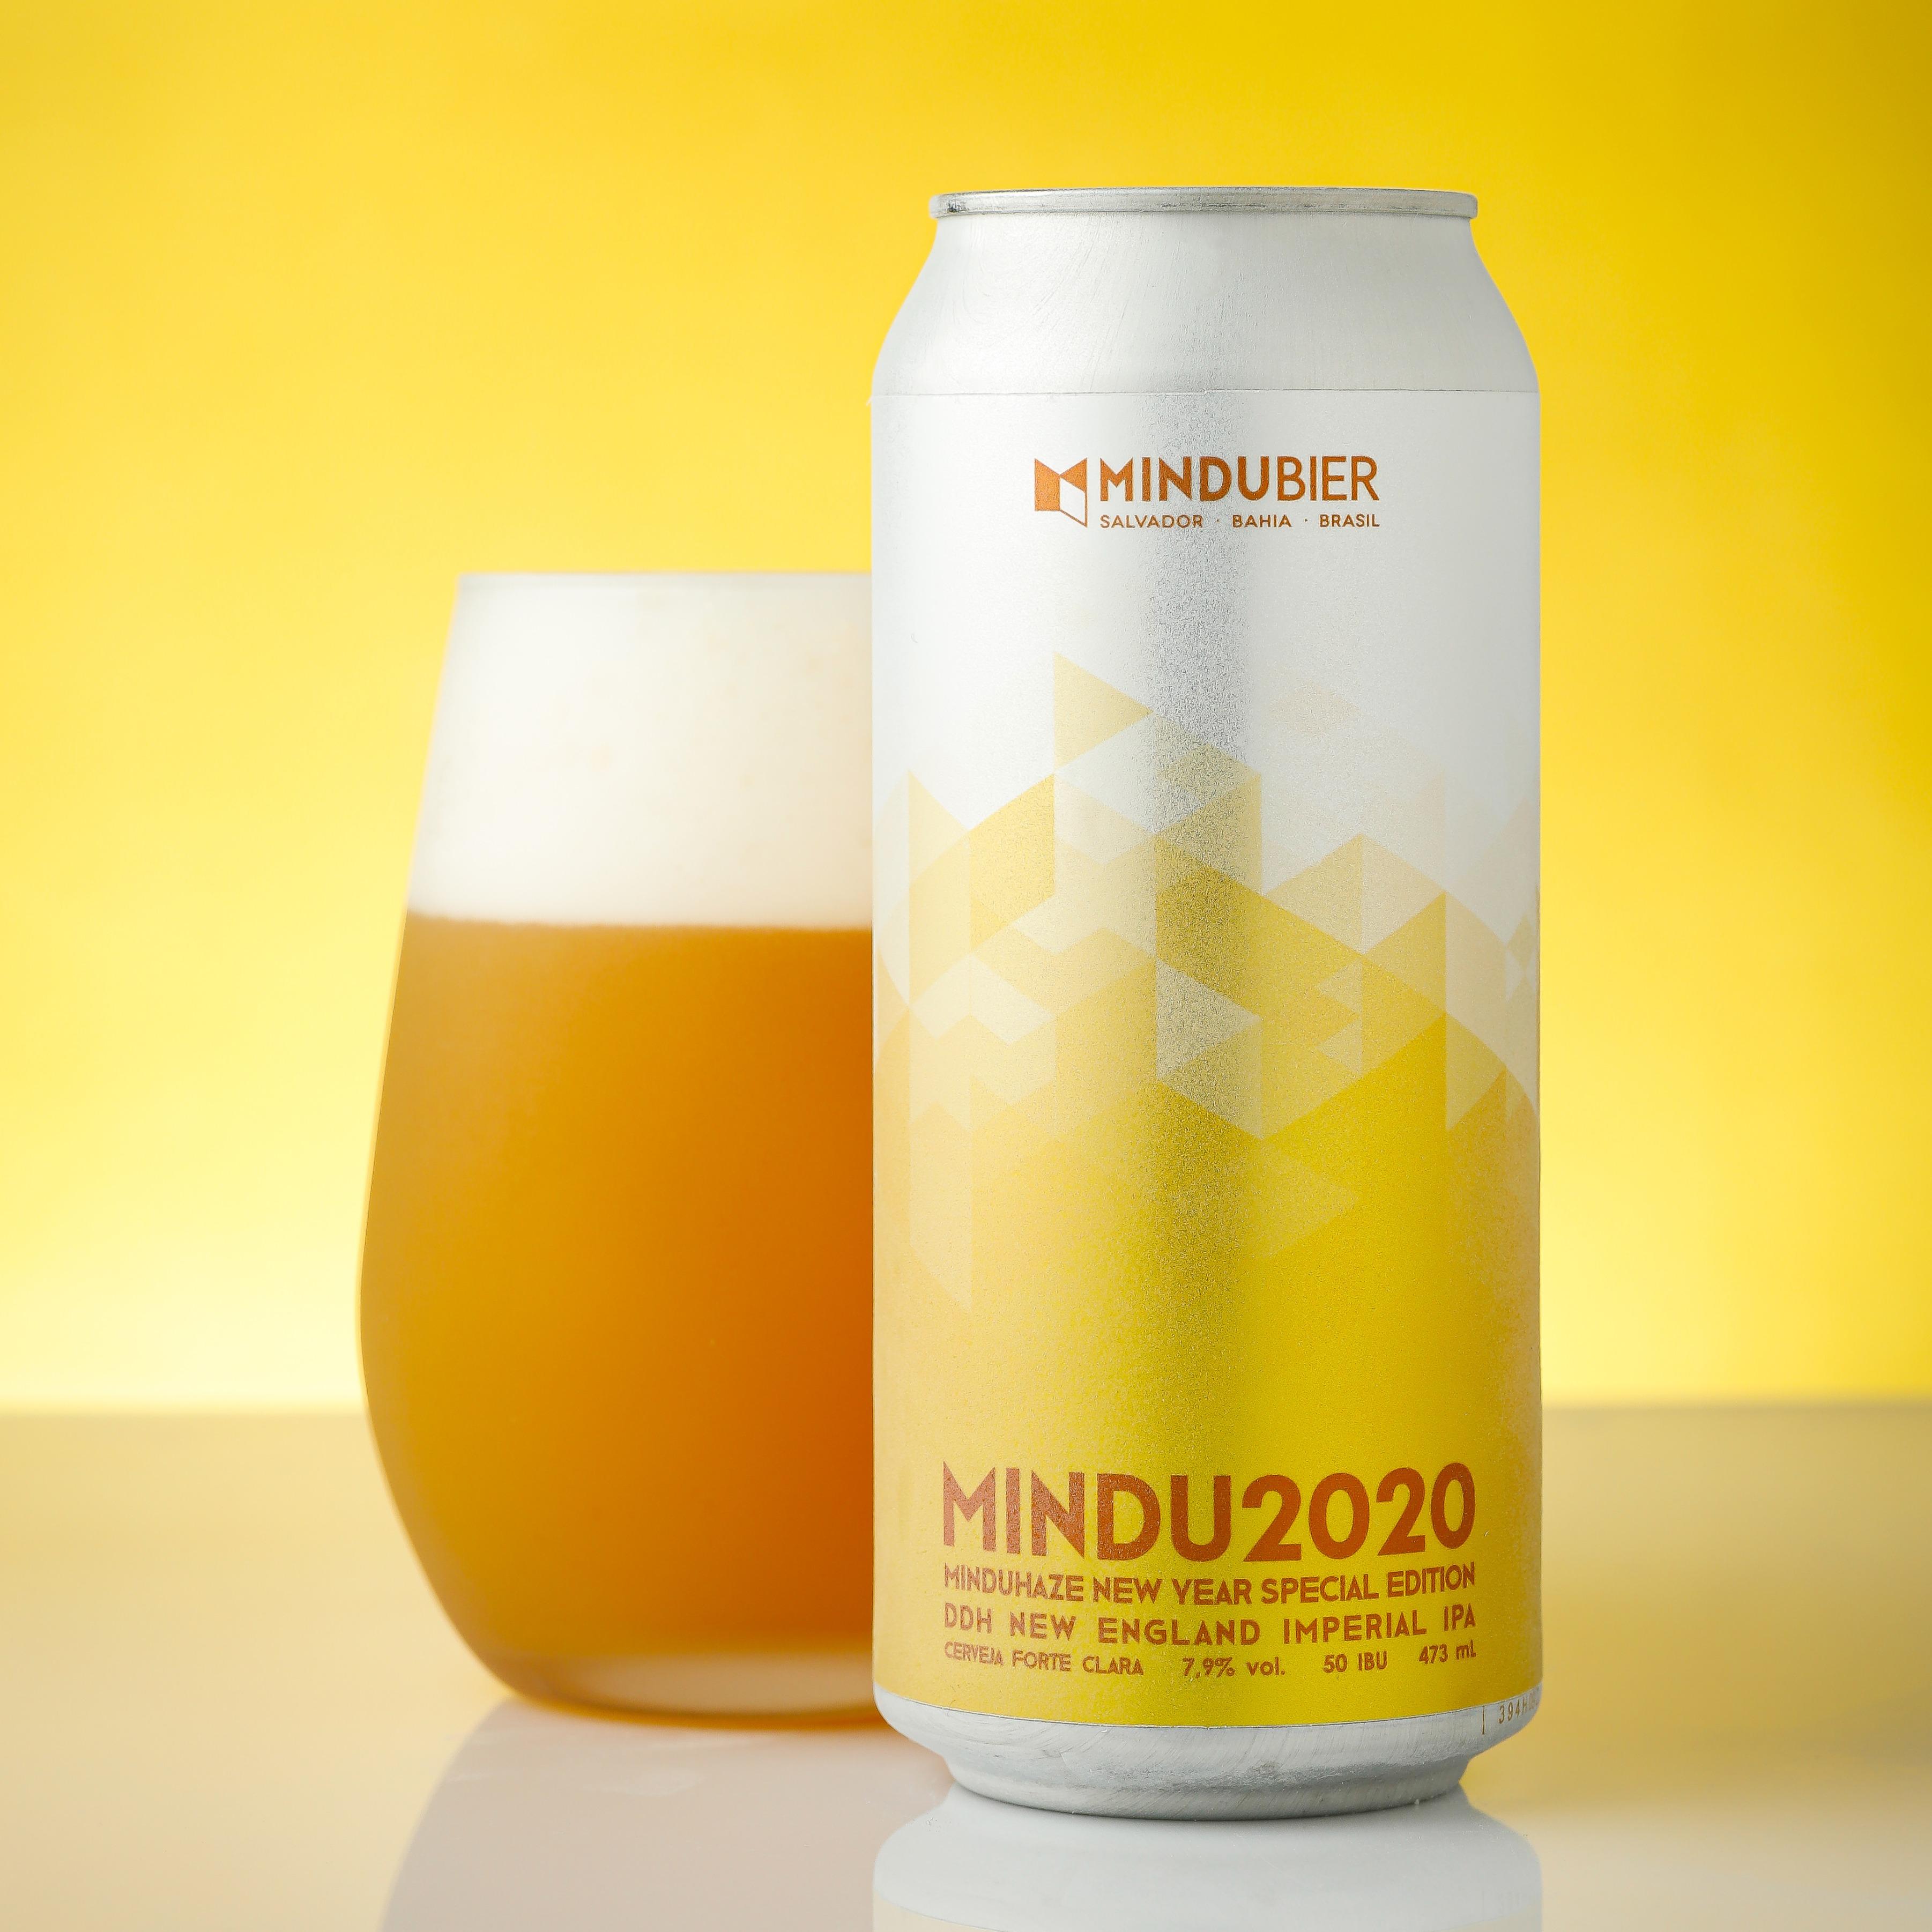 Mindu2020